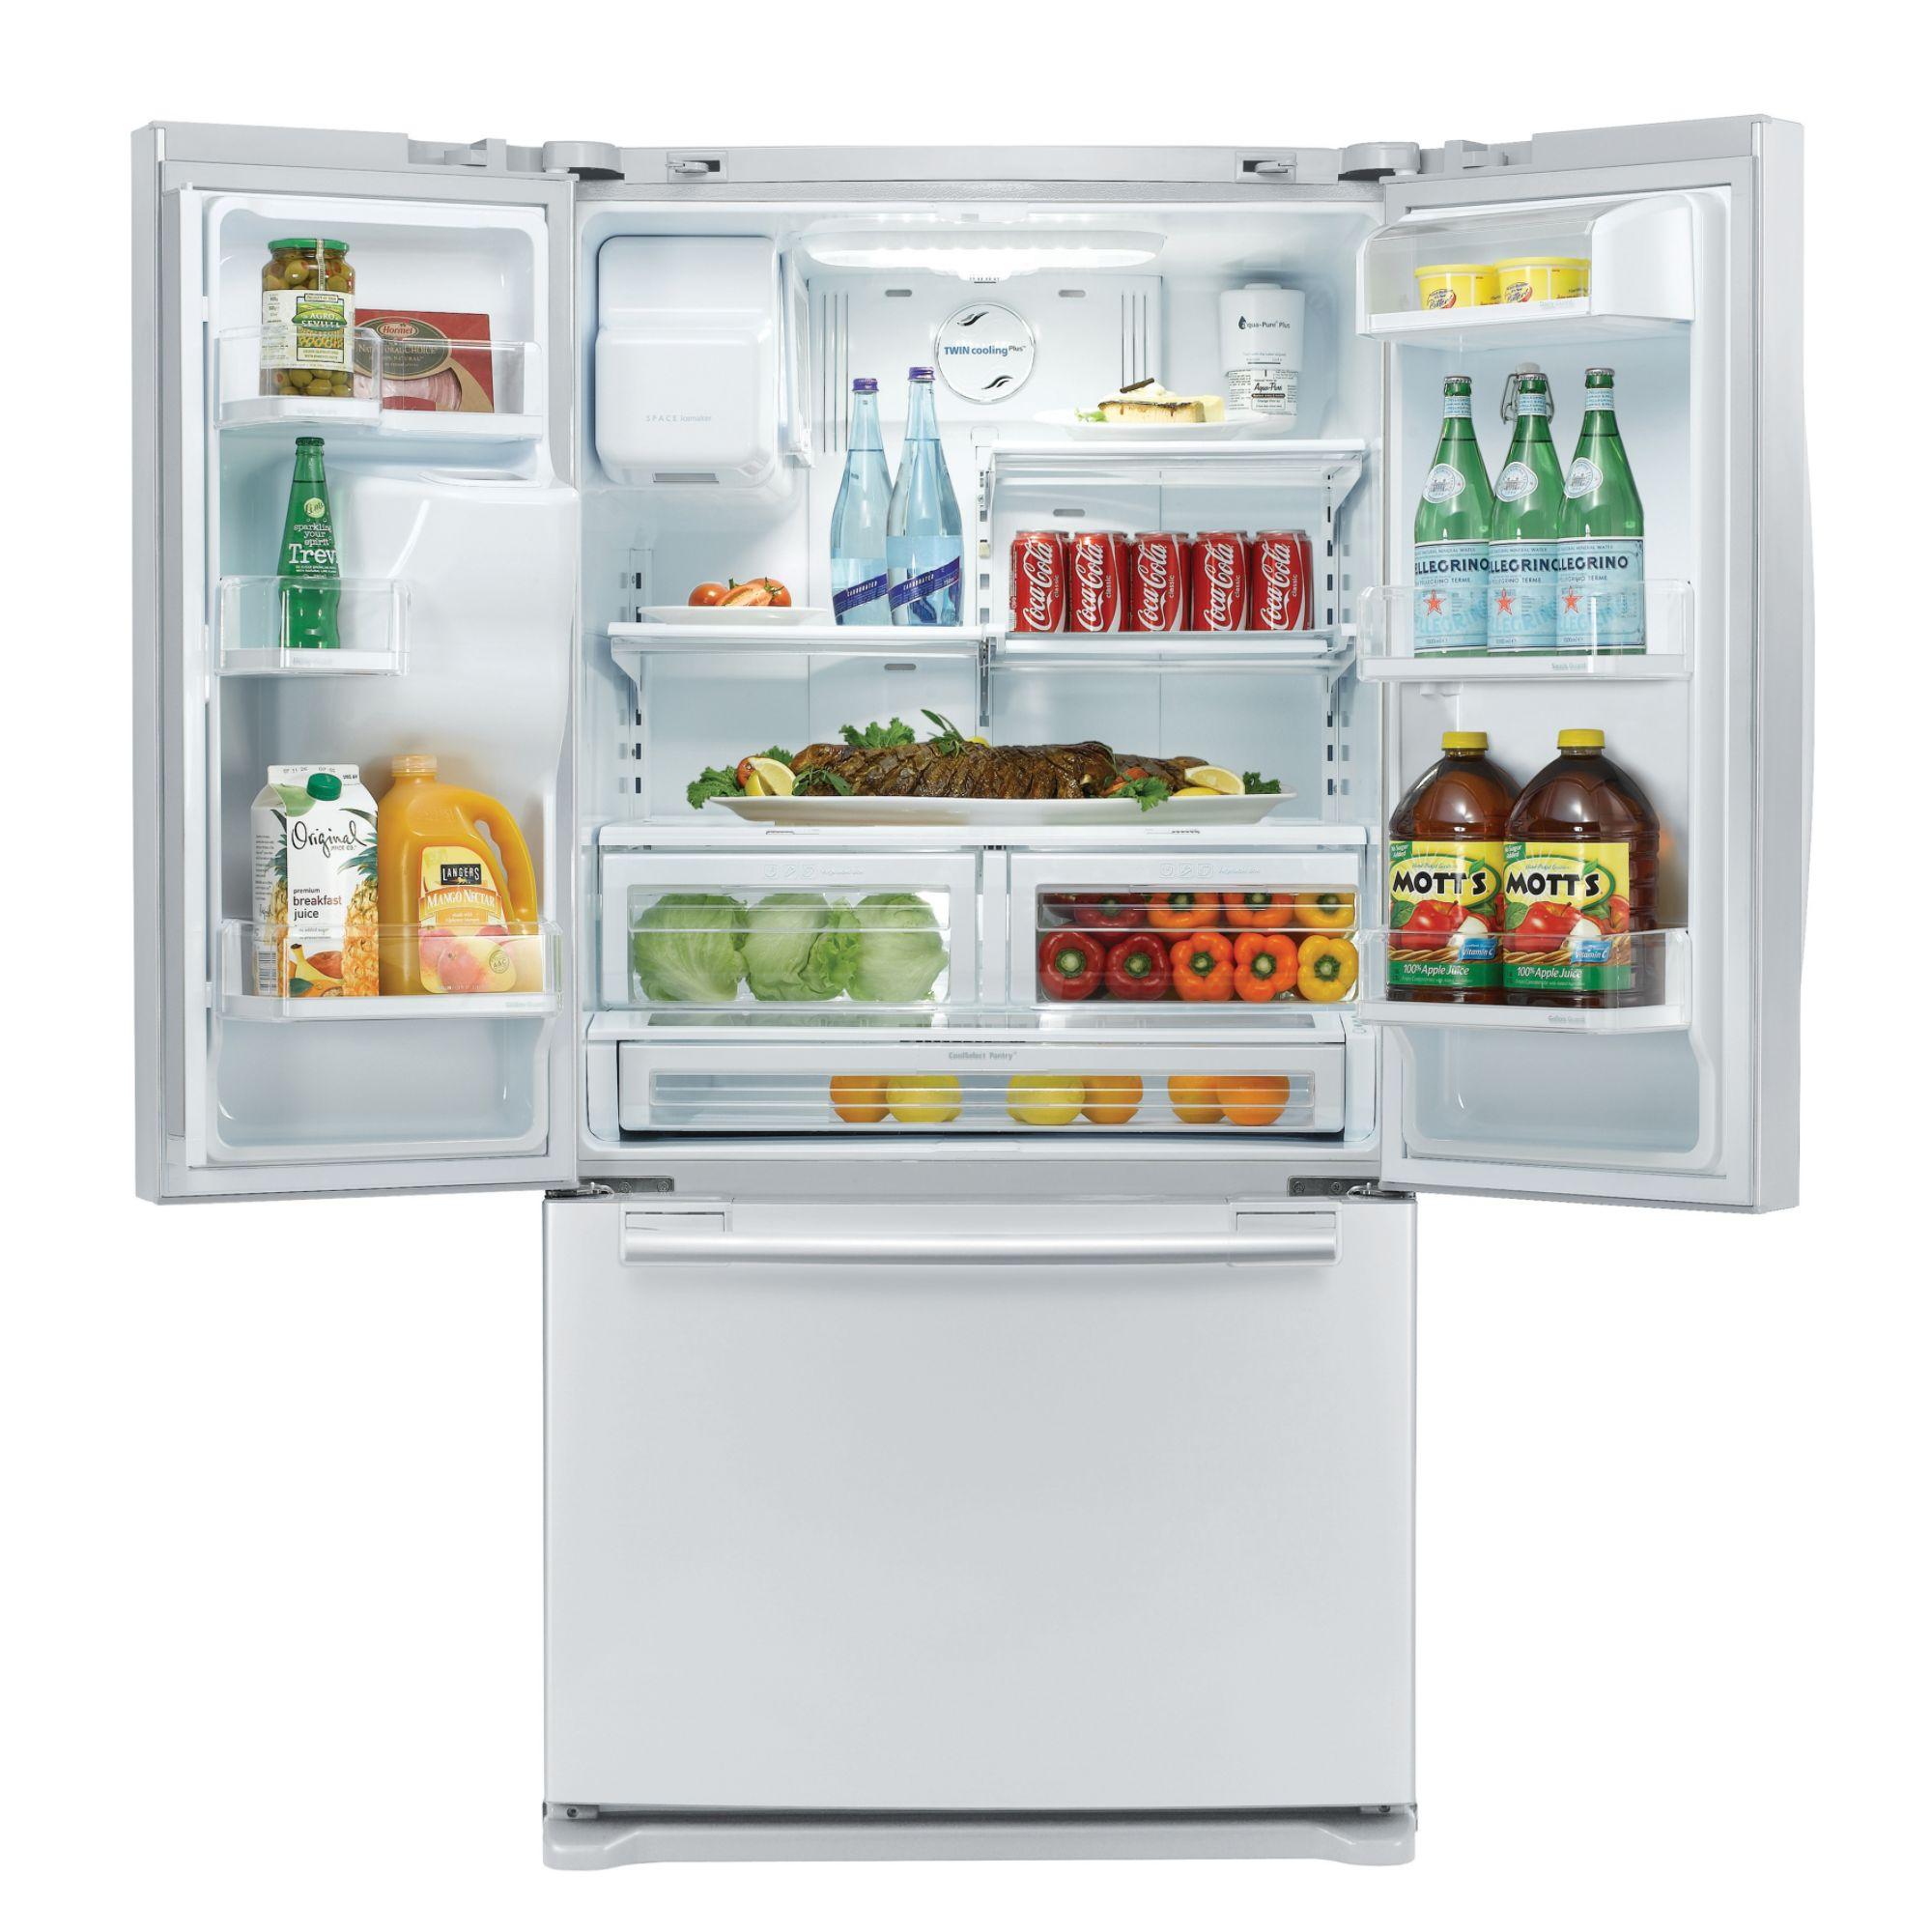 Samsung 23.0 cu. ft. Counter-Depth French-Door Refrigerator